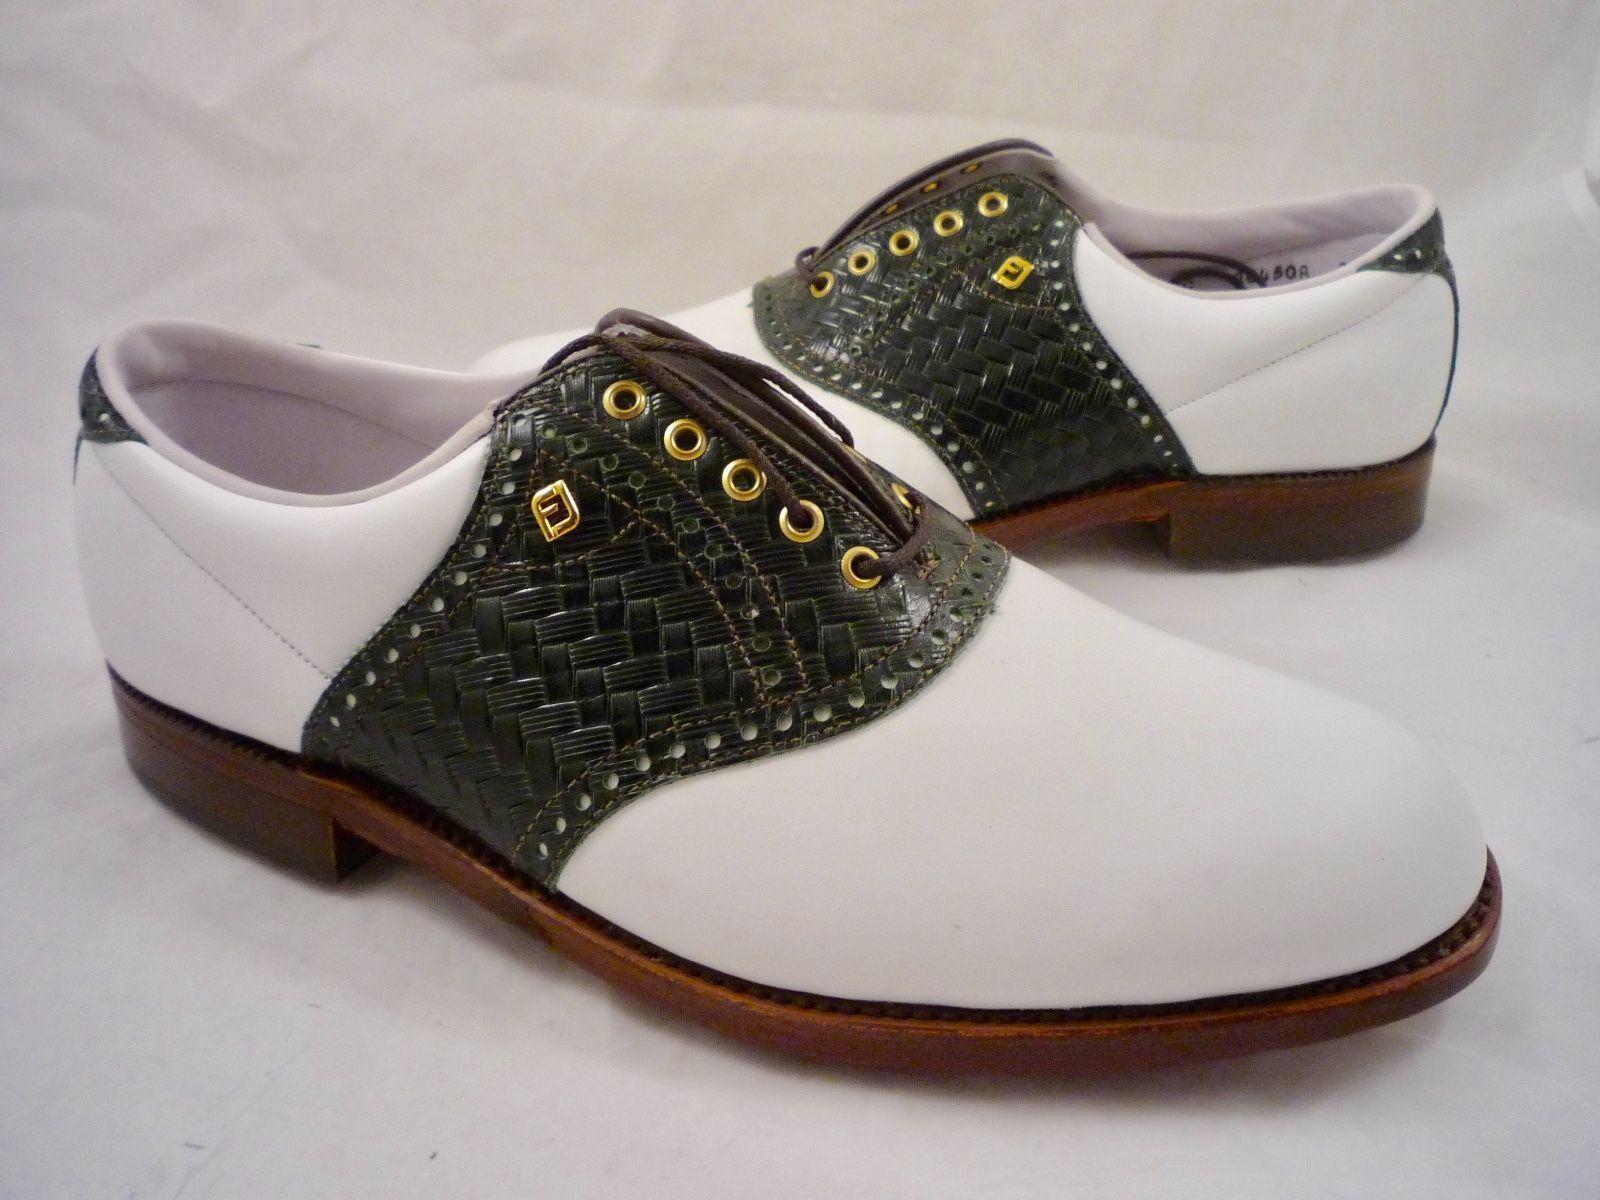 ce36c1fca18 FootJoy Classics Originals 2 Pair Leather Saddle Golf Shoes Brown  400 NEW